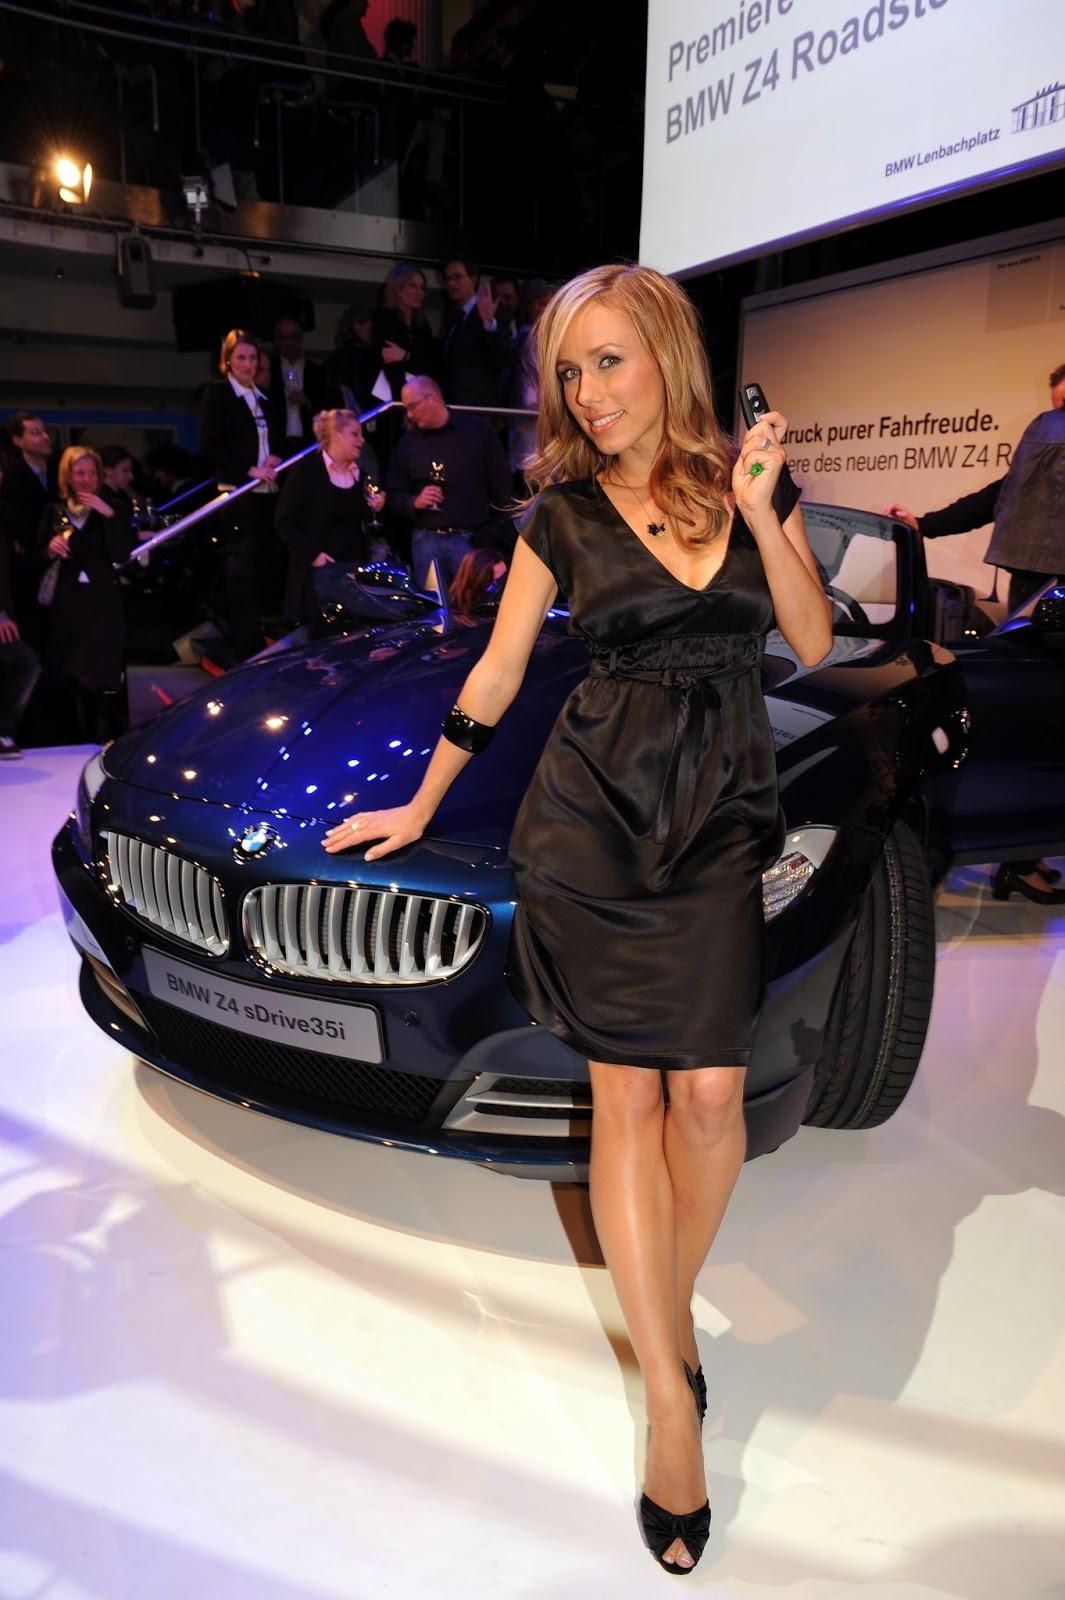 Annemarie Warnkross HQ Photos At BMW Presents New Z4